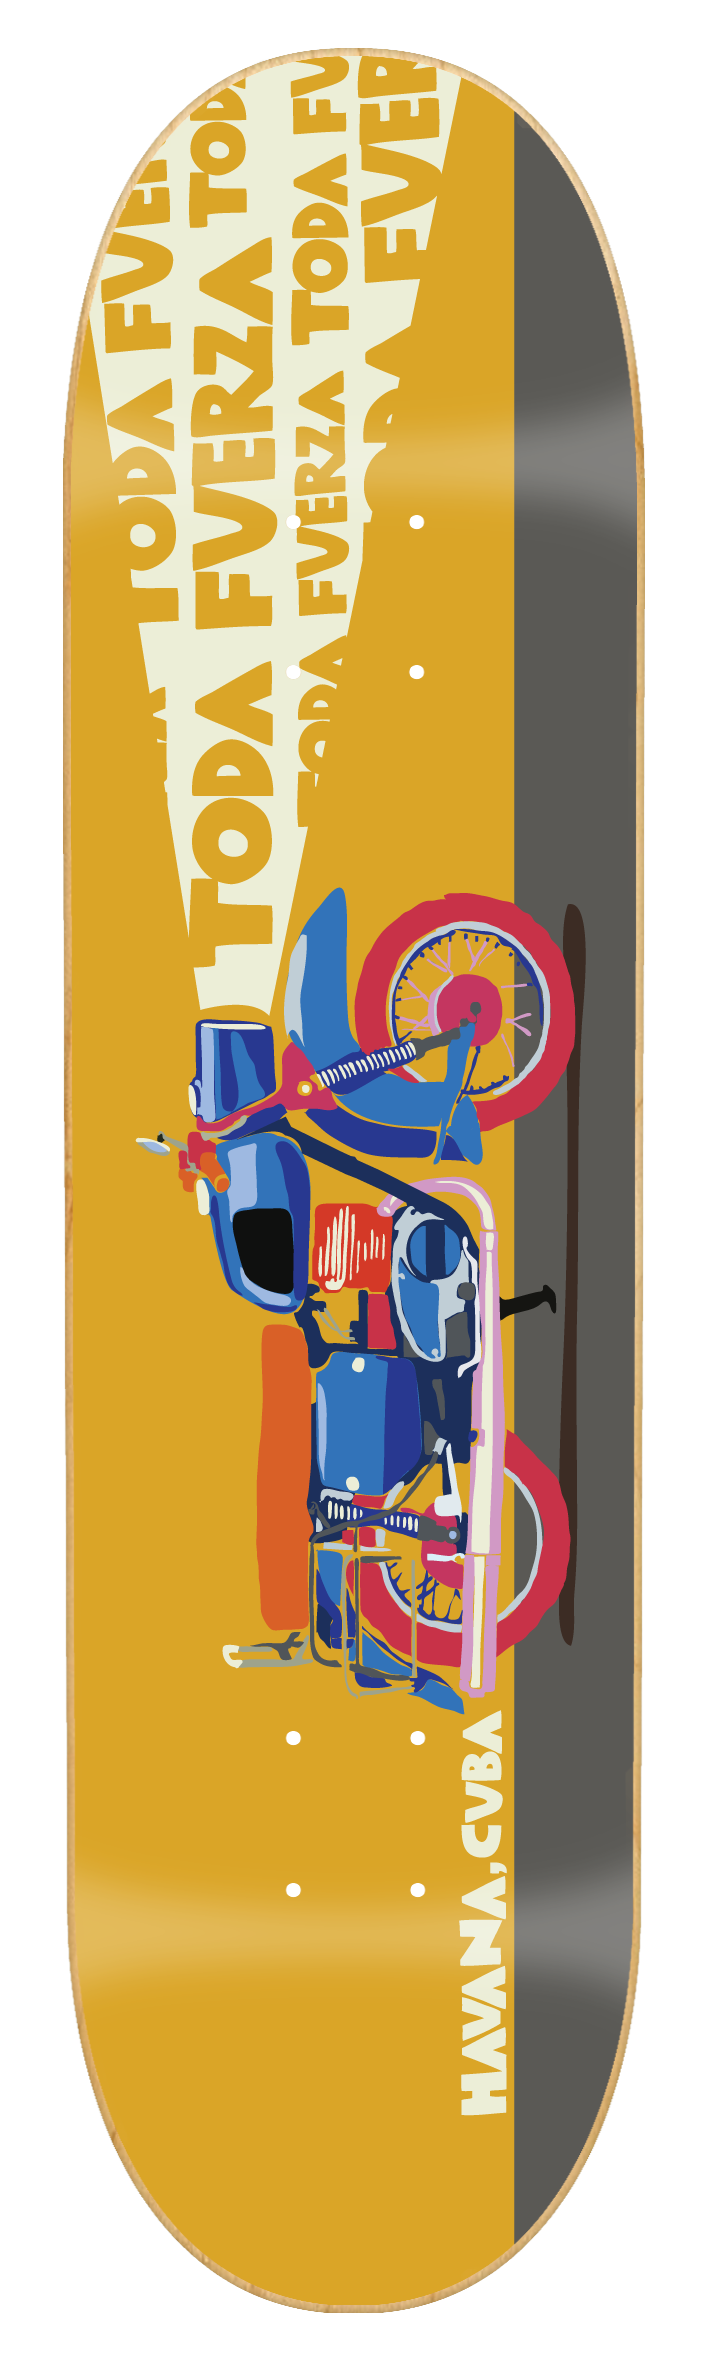 toda-fuerza-motorcycle-mockup.png